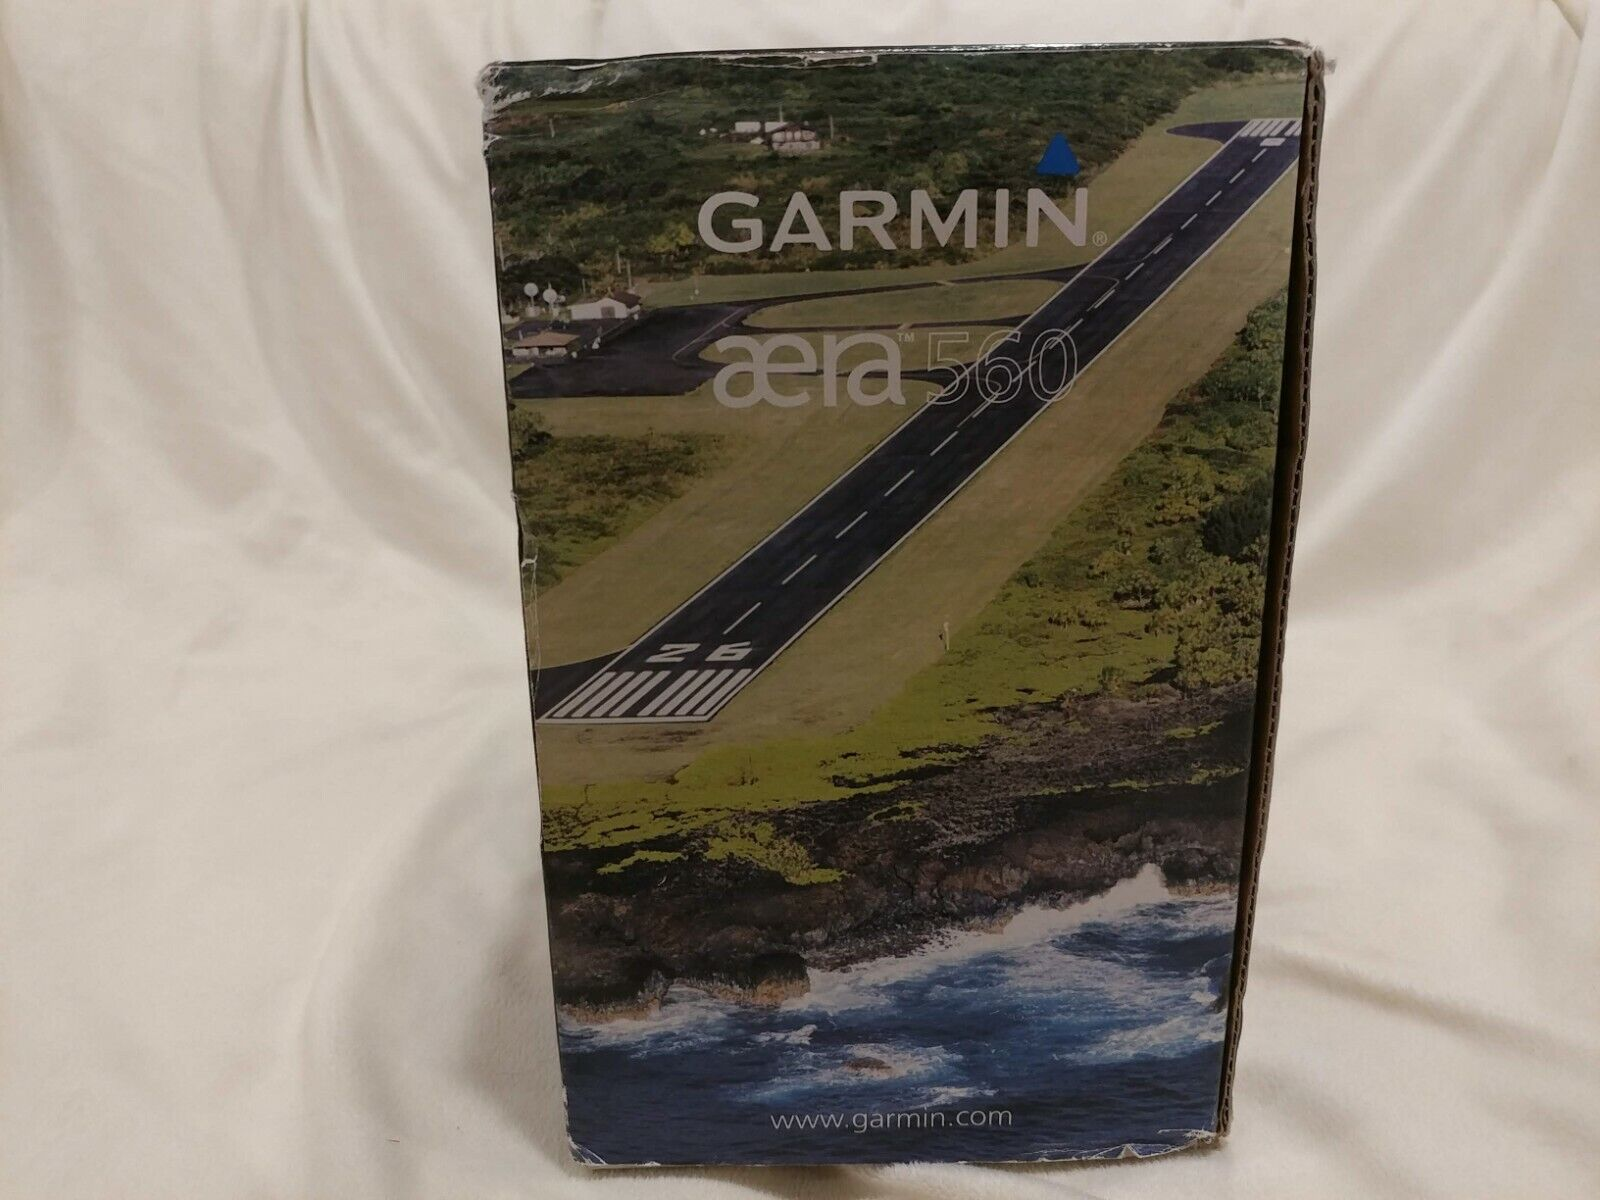 Garmin Aera 560 Retail Cardboard Box Only - No other items